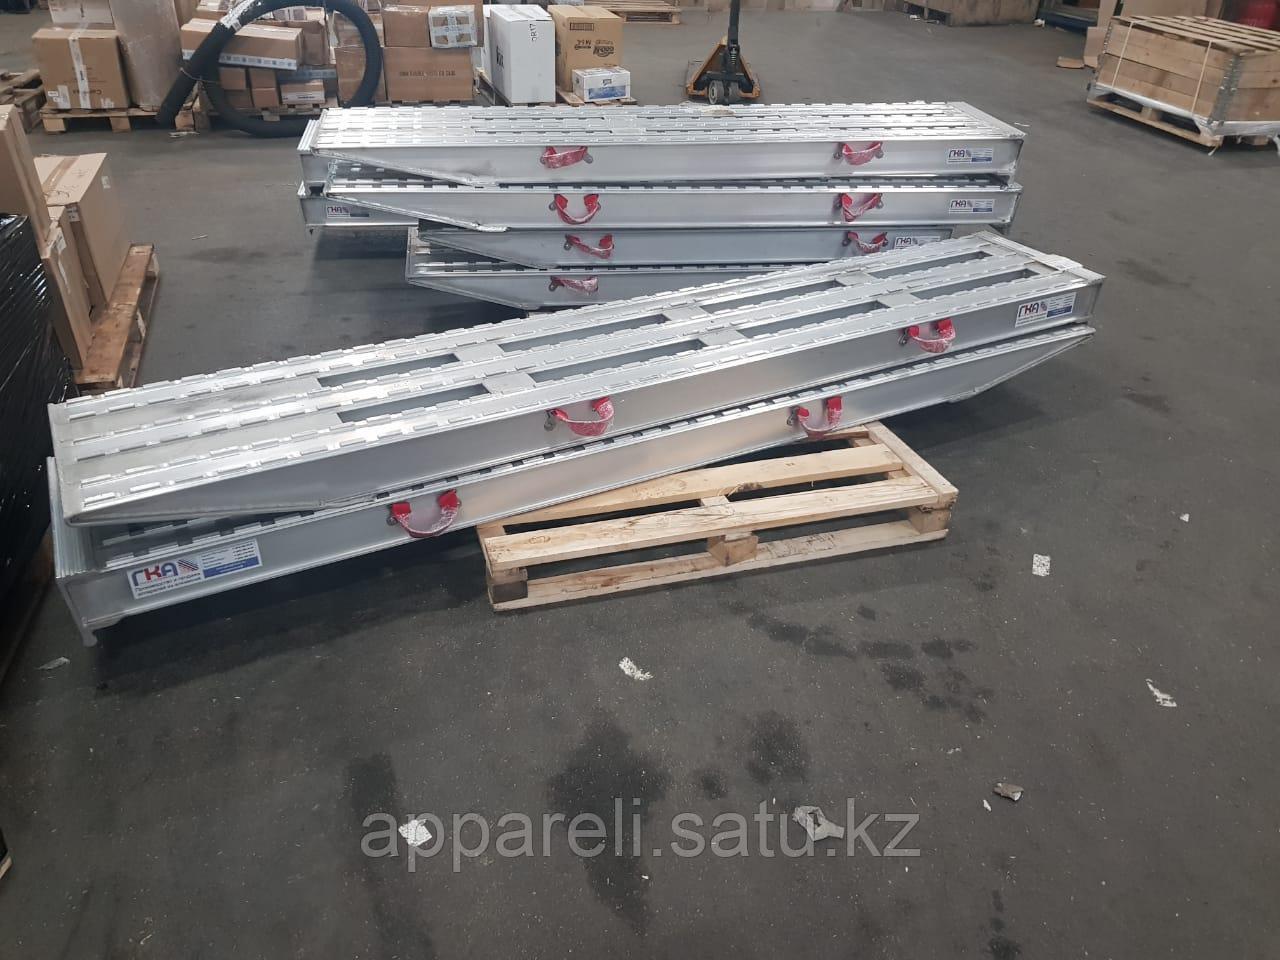 Производство аппарелей для спецтехники 3,1 метра